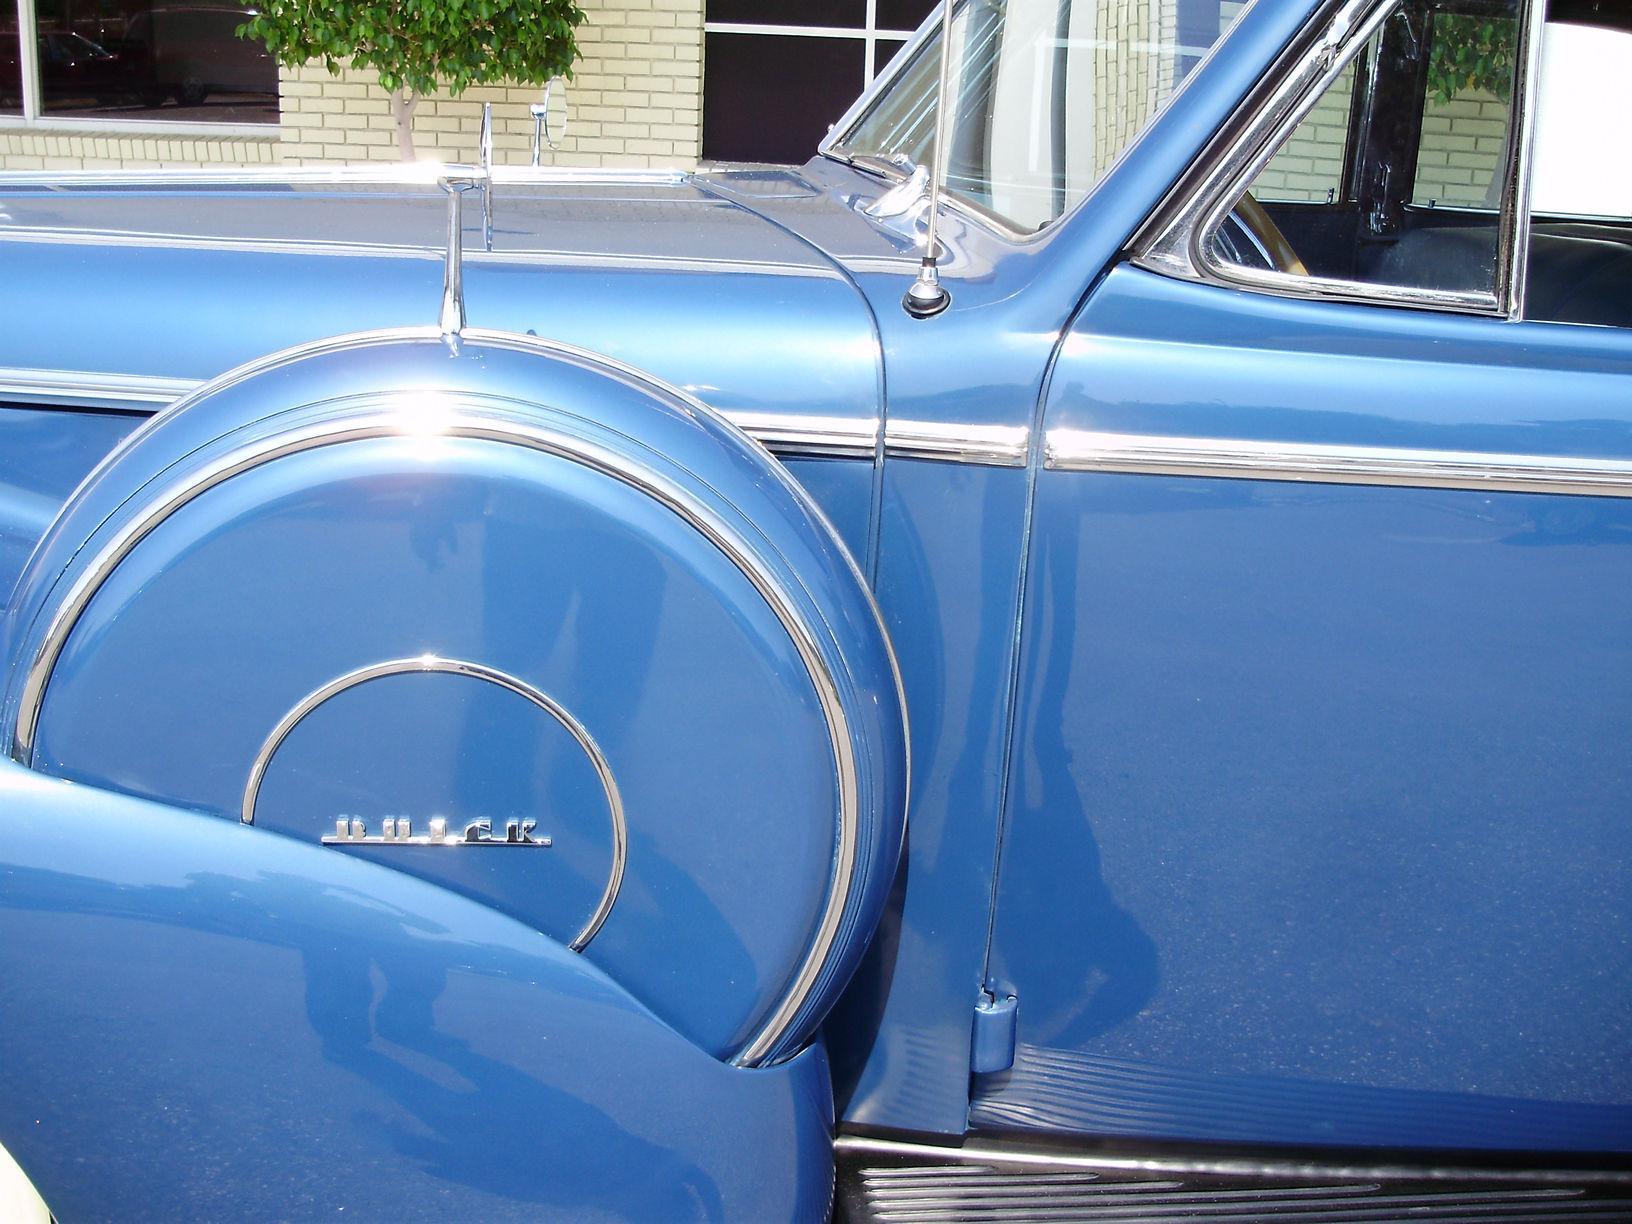 1940 BUICK CENTURY CONVERTIBLE SEDAN - Vintage Motors of Sarasota Inc. #20